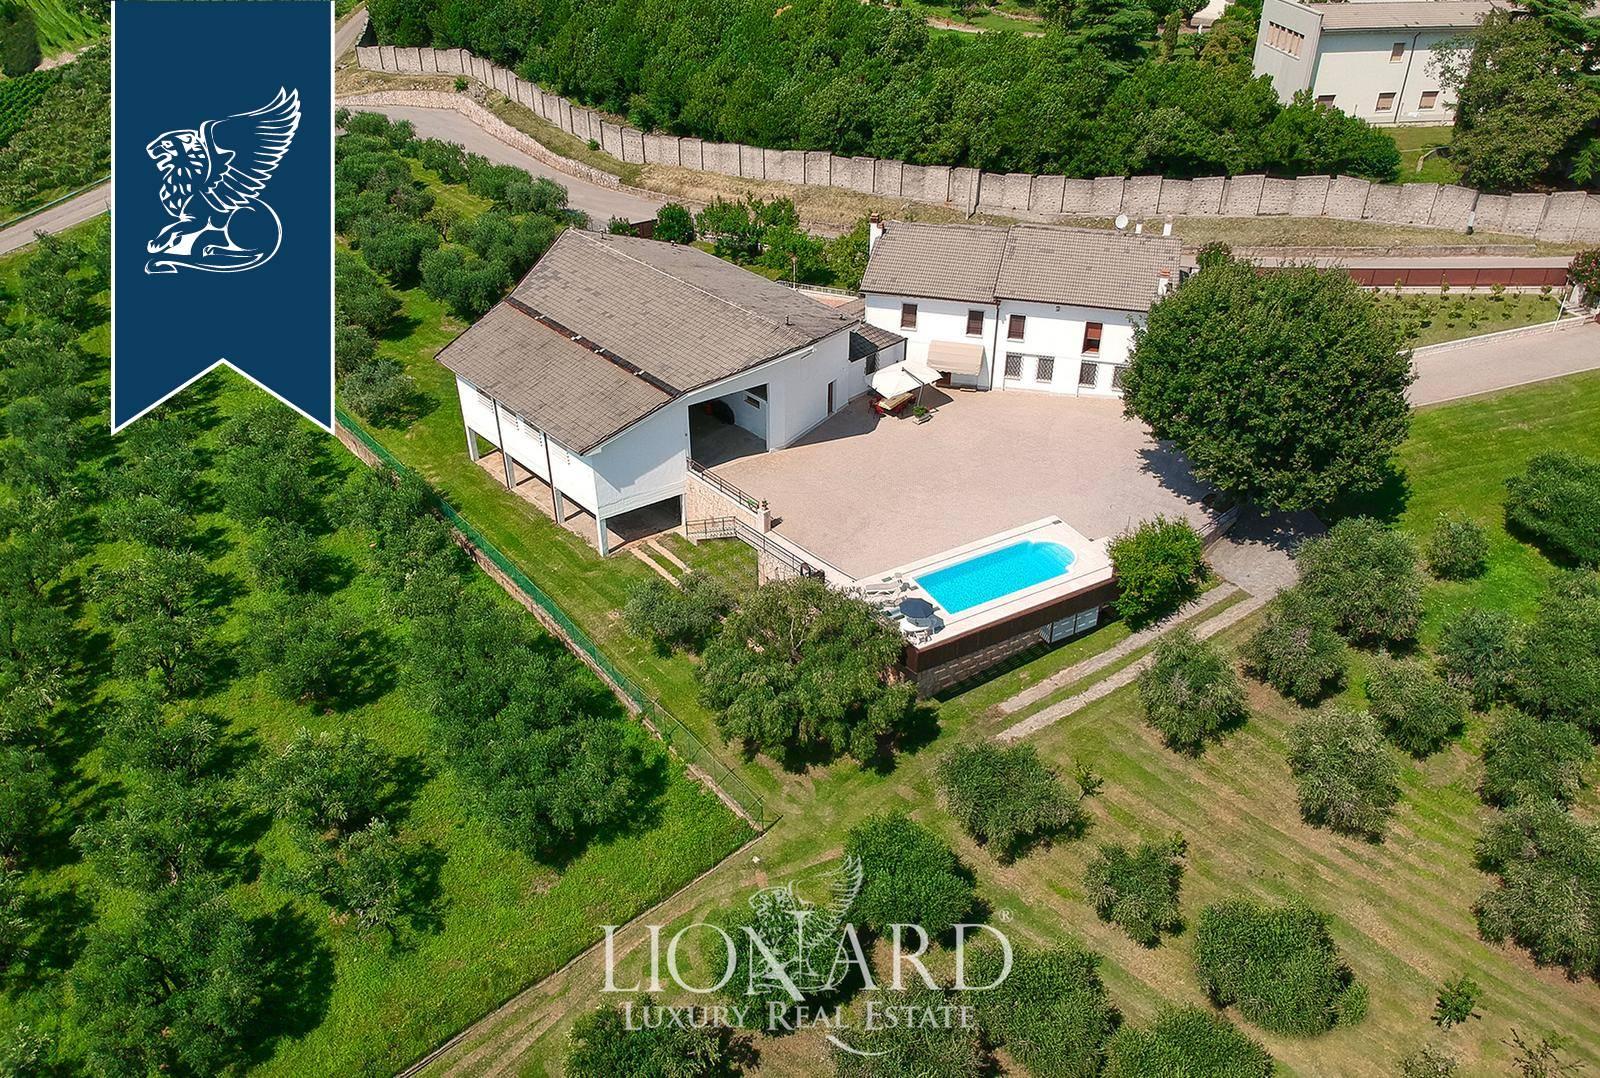 Villa in Vendita a Verona: 0 locali, 1000 mq - Foto 4